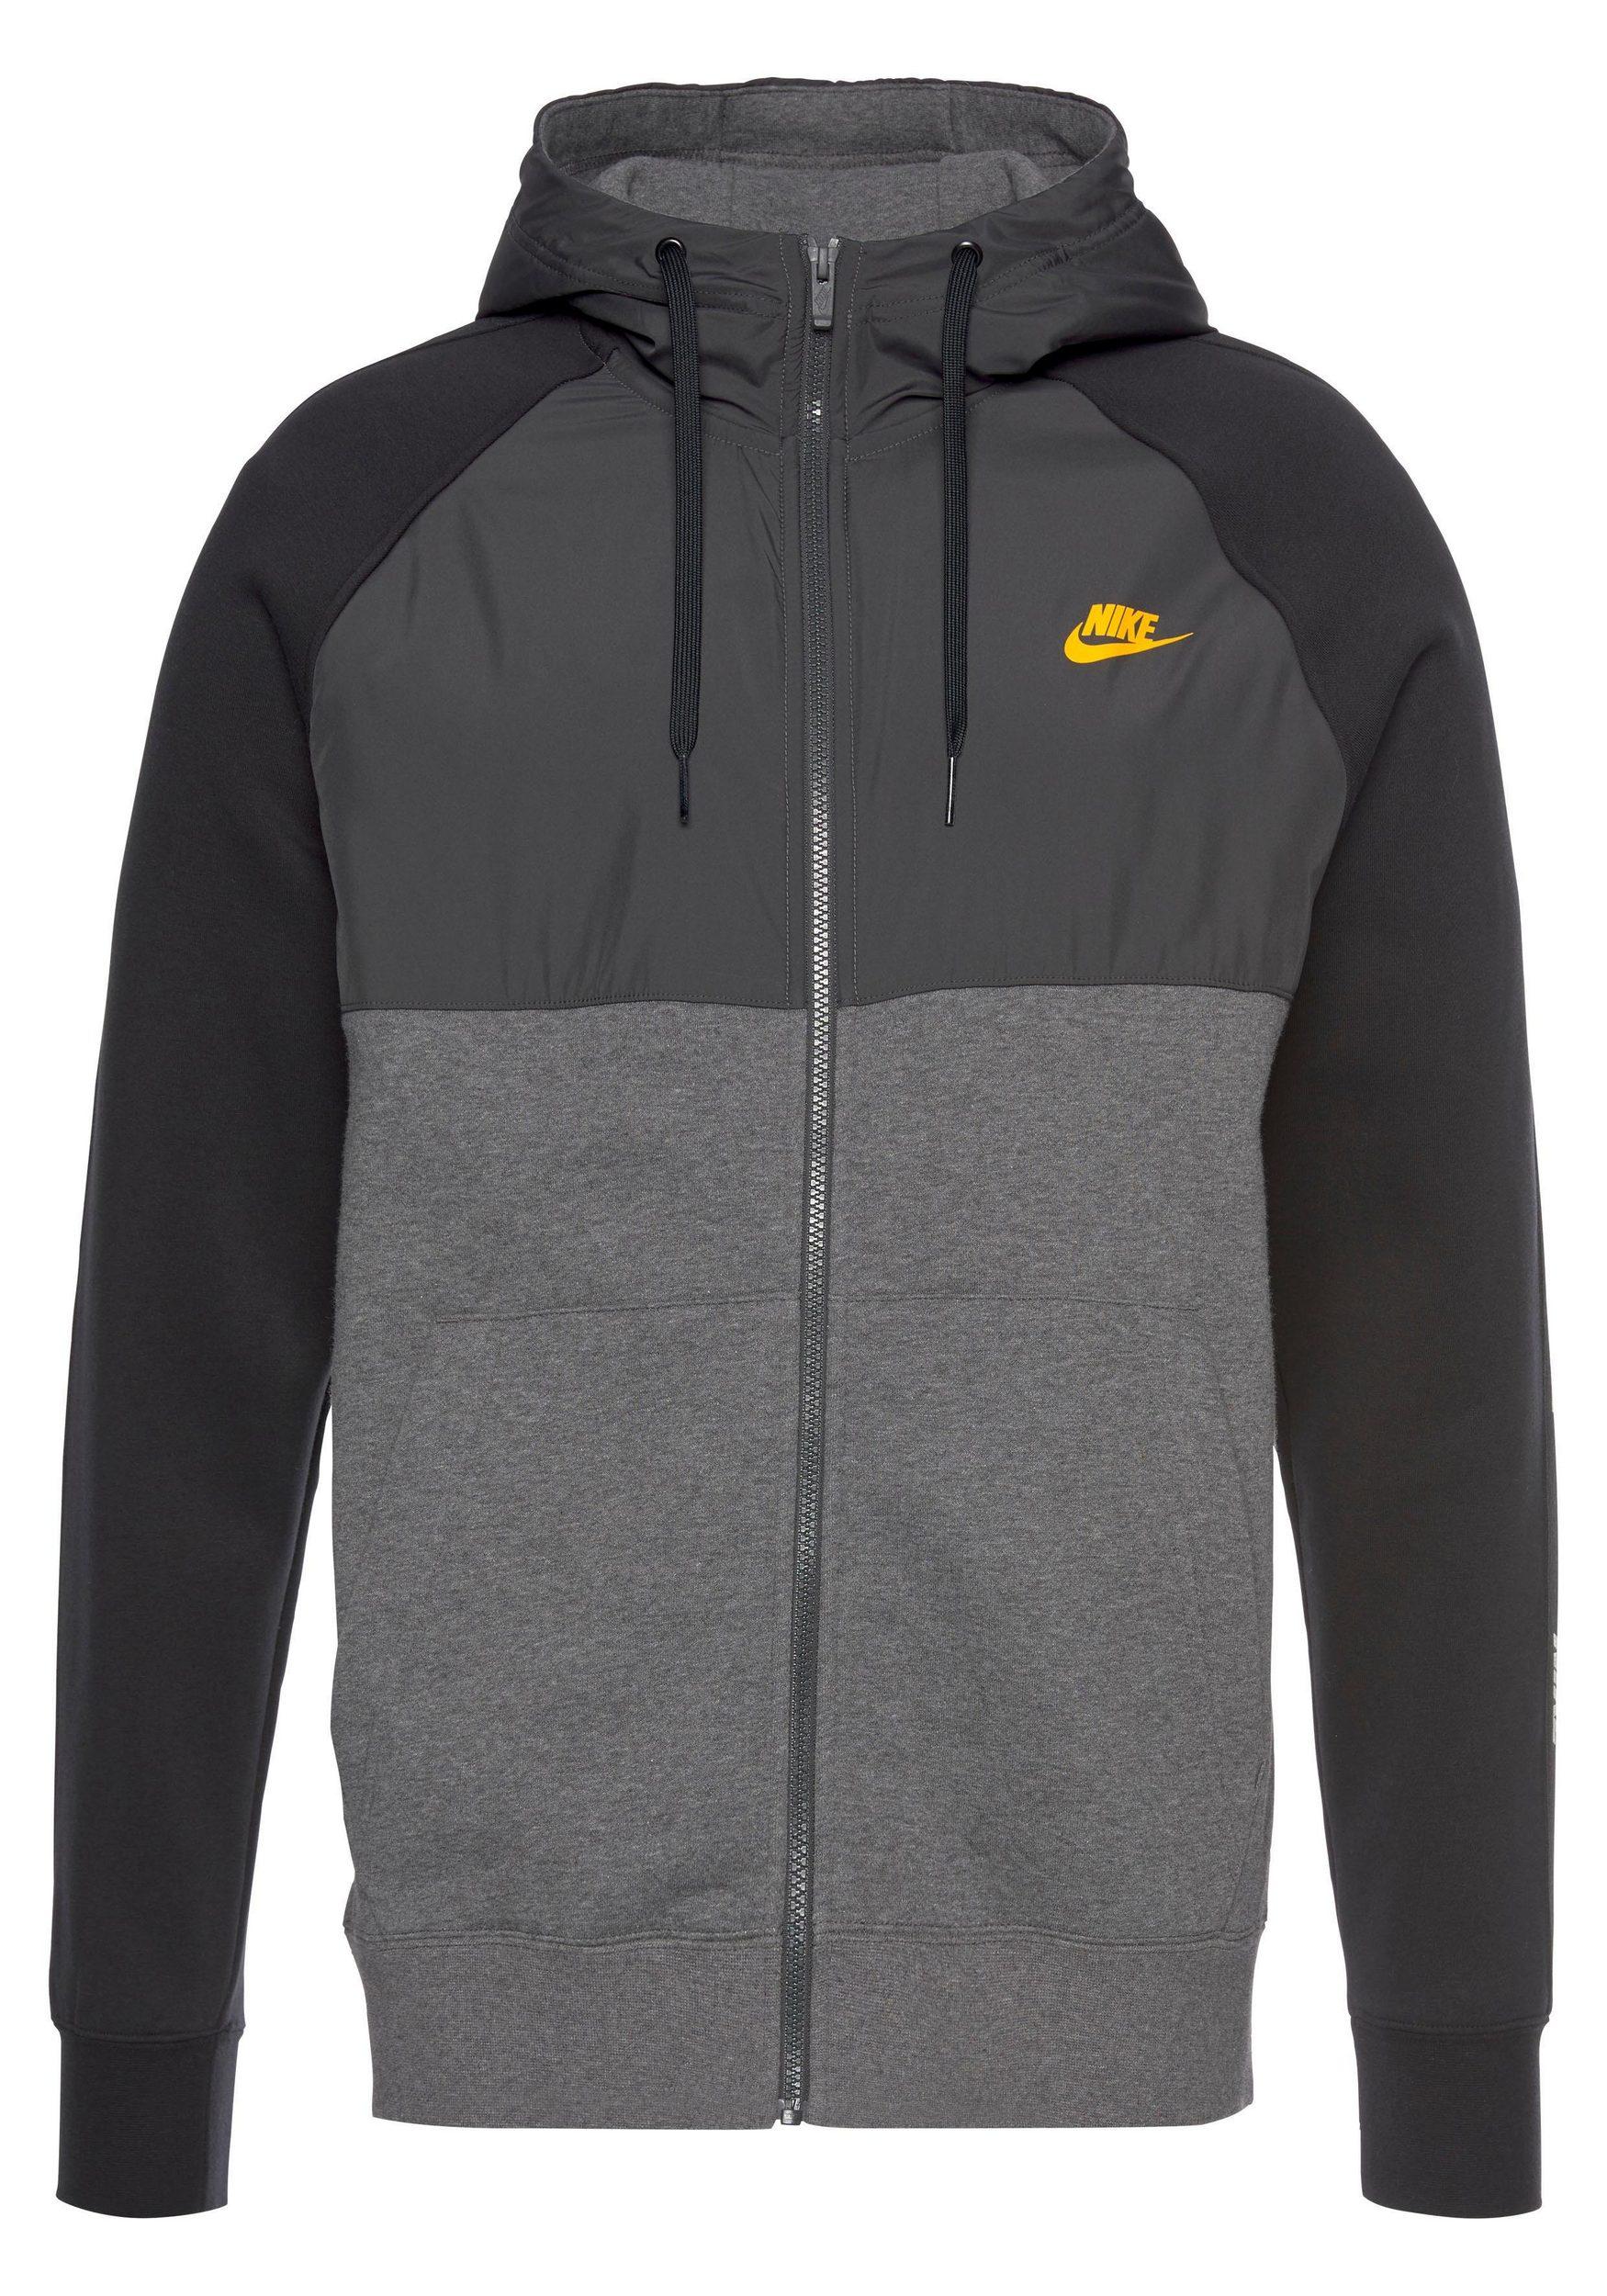 Nike Herren Sportswear Full Zip Hoodie Kapuzenjacke schwarz grau hellgrau gold